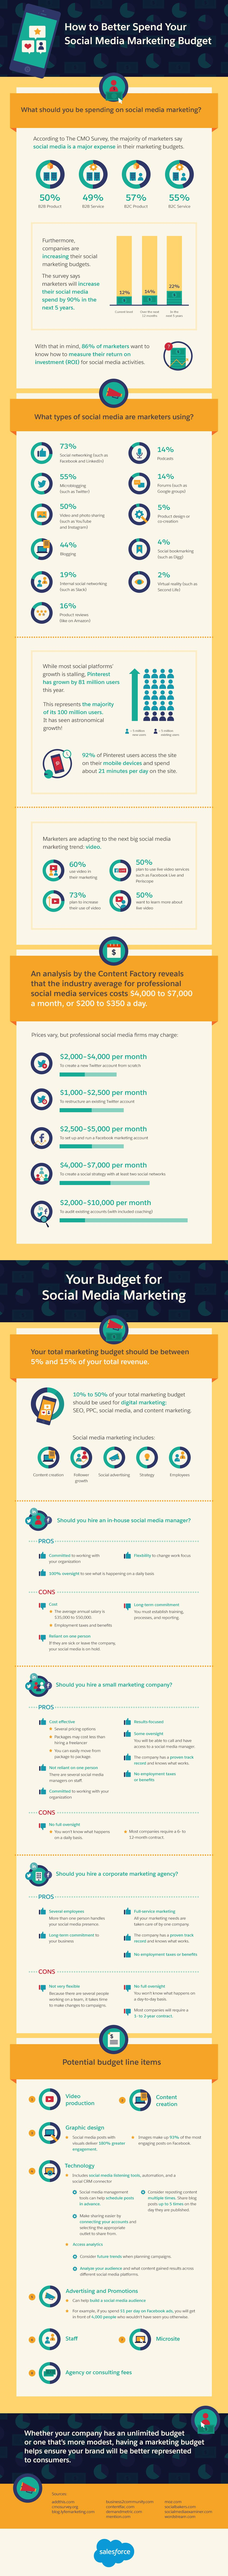 infografica budget social media